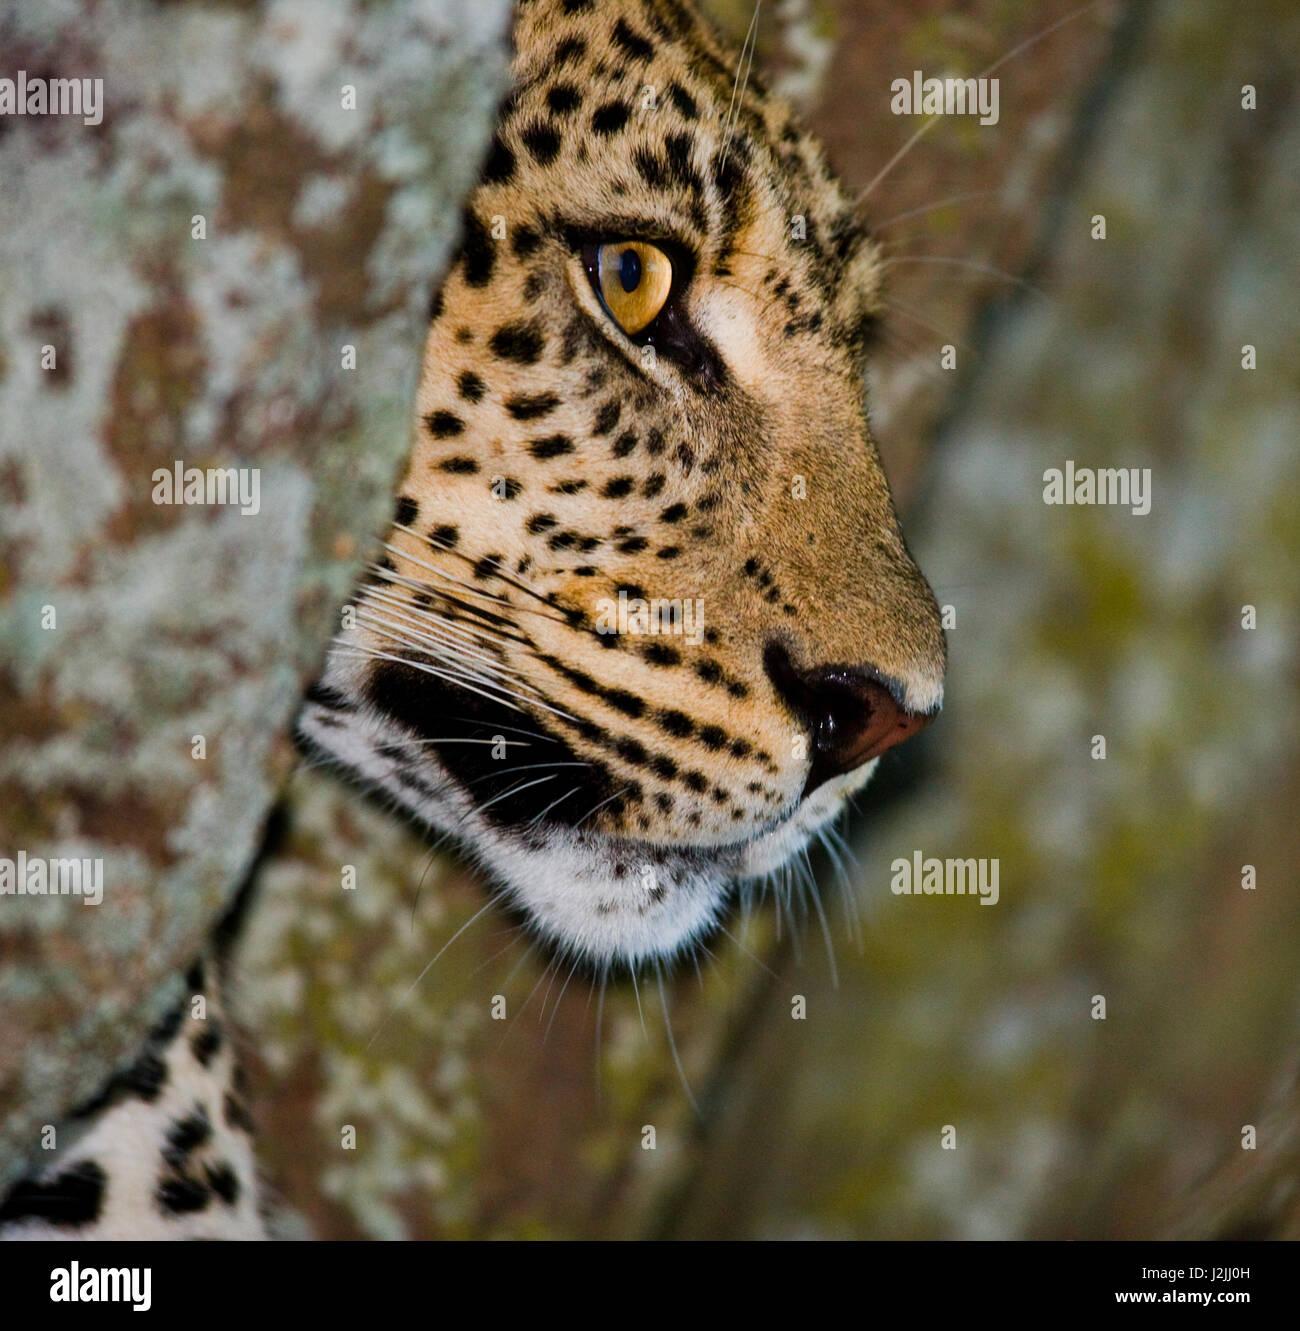 Leopard looks out from behind a tree. National Park. Kenya. Tanzania. Maasai Mara. Serengeti. An excellent illustration. - Stock Image